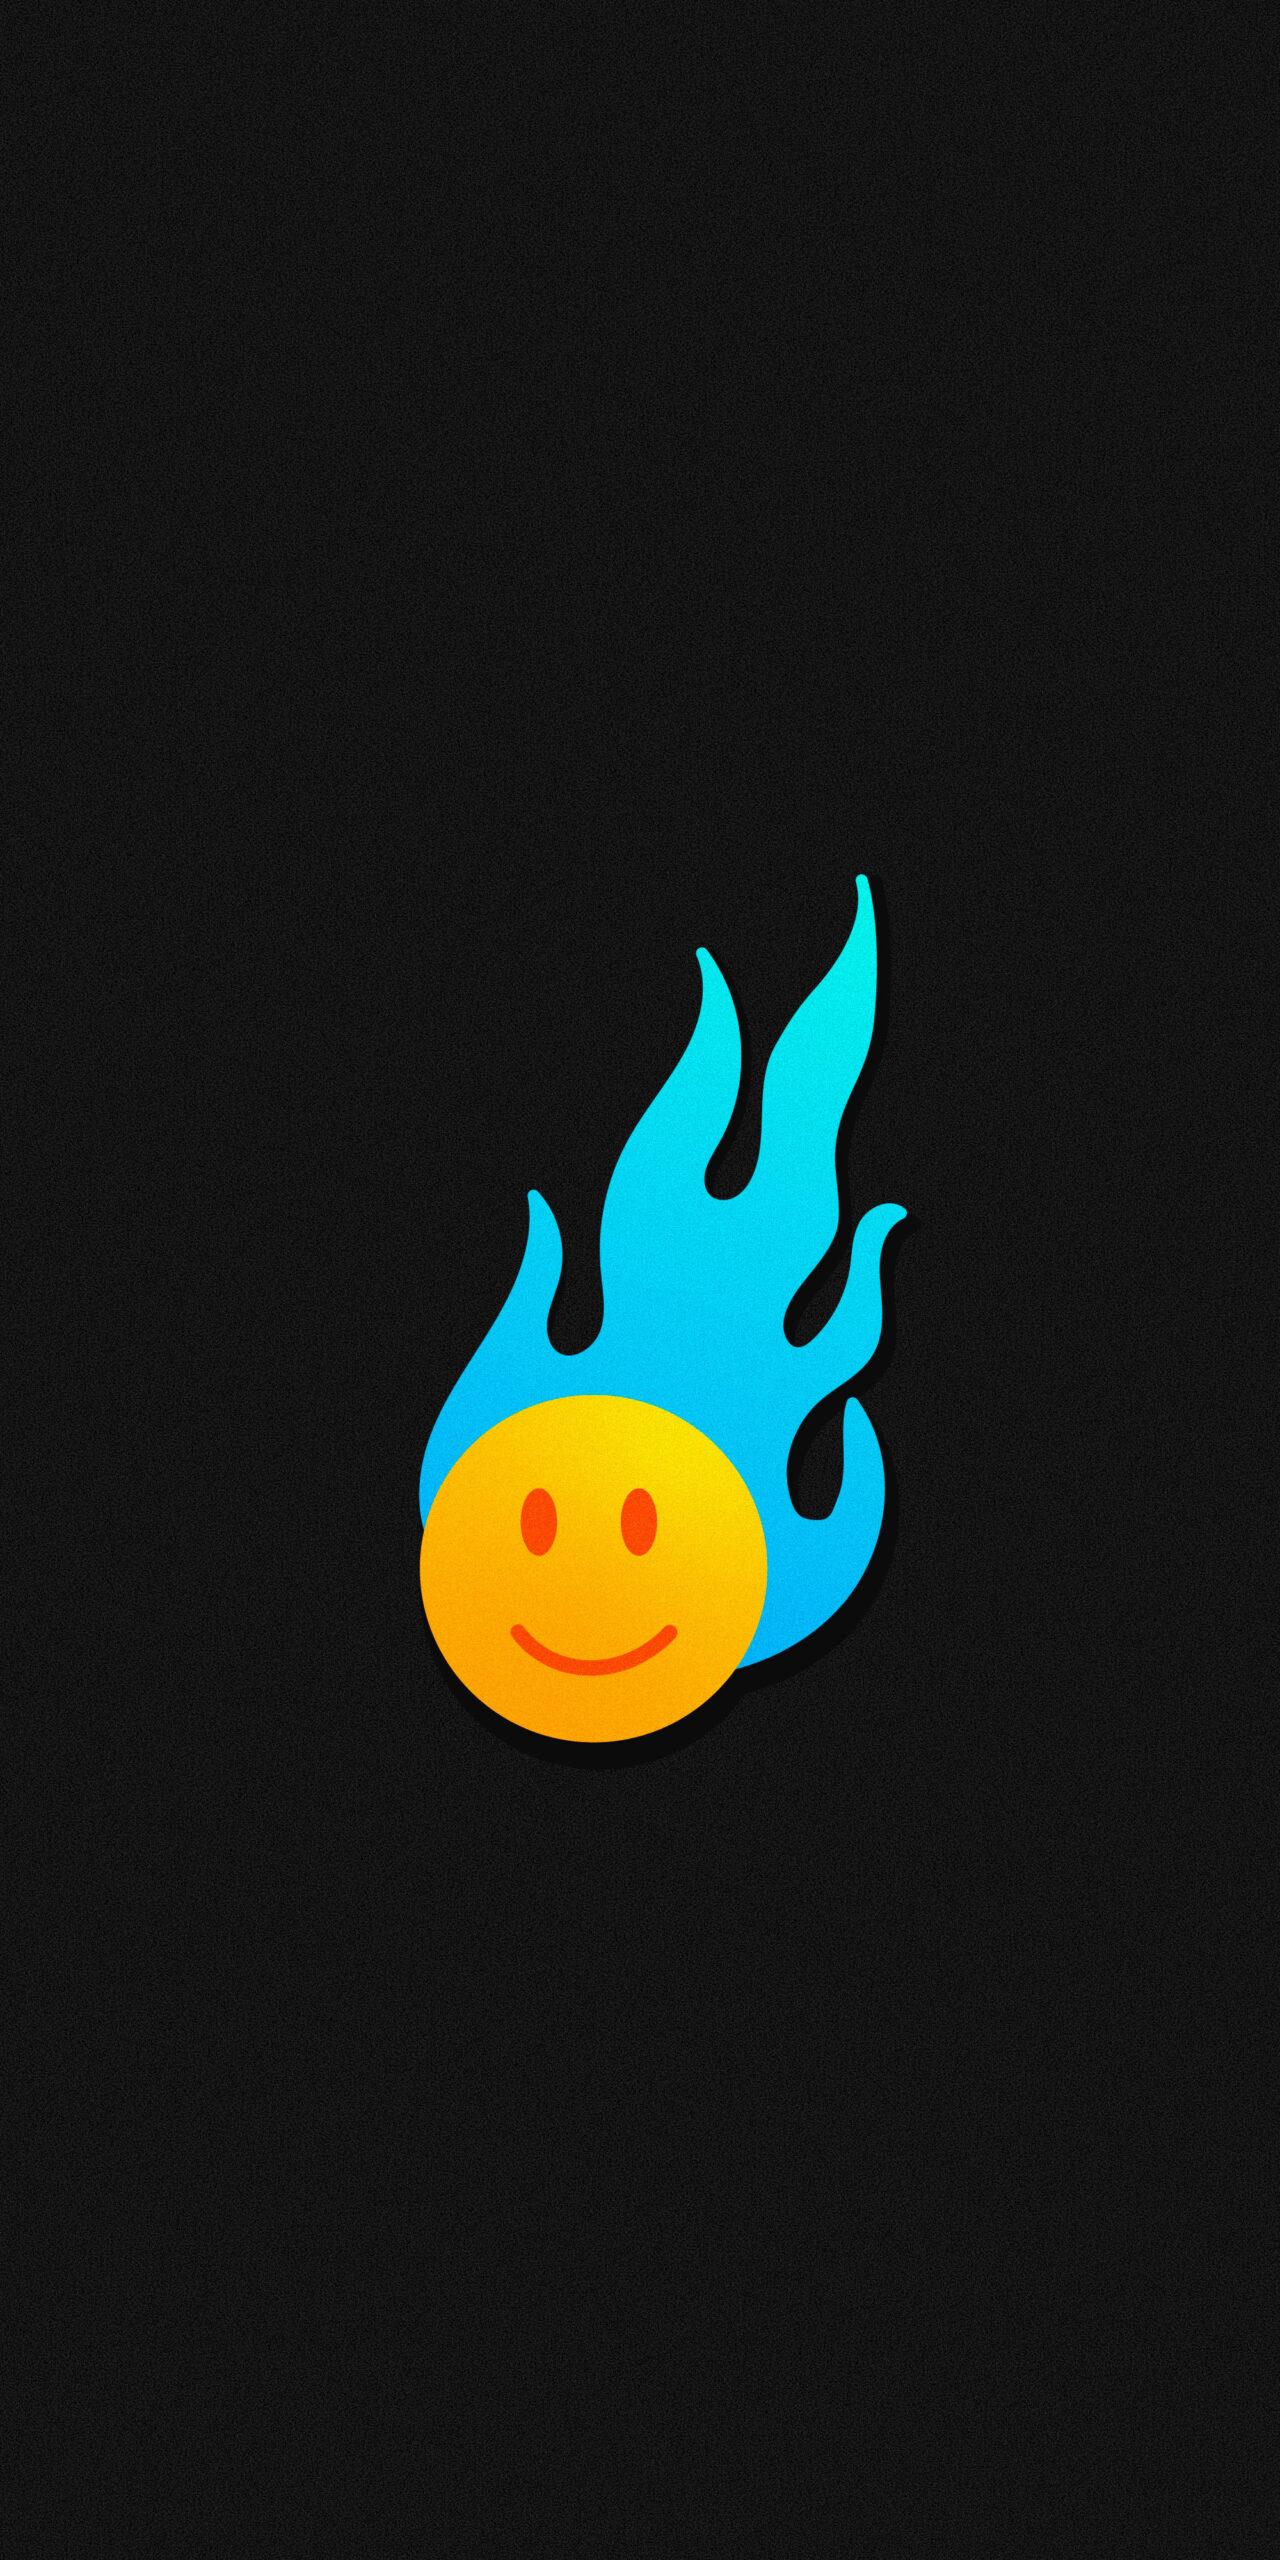 smile face blue flame black wallpaper